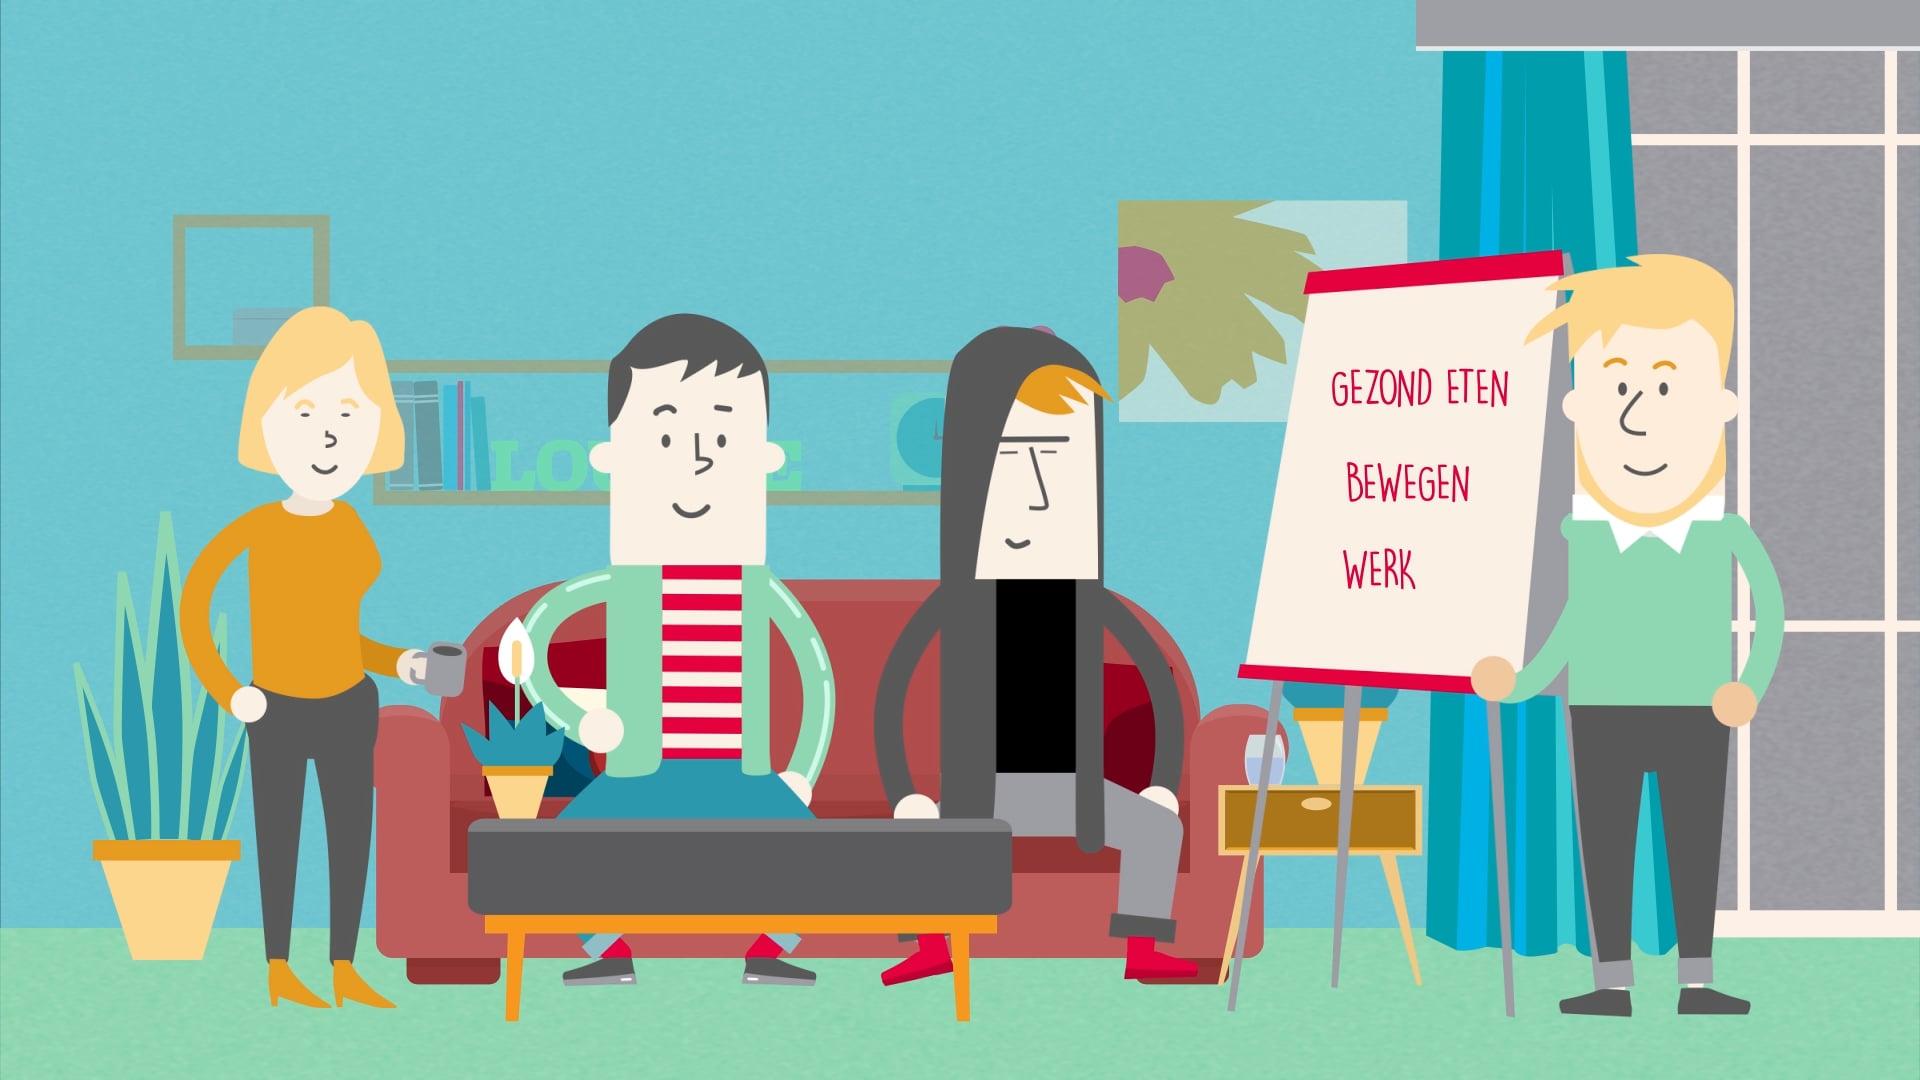 Healthy Solutions - KR8 programma animatie